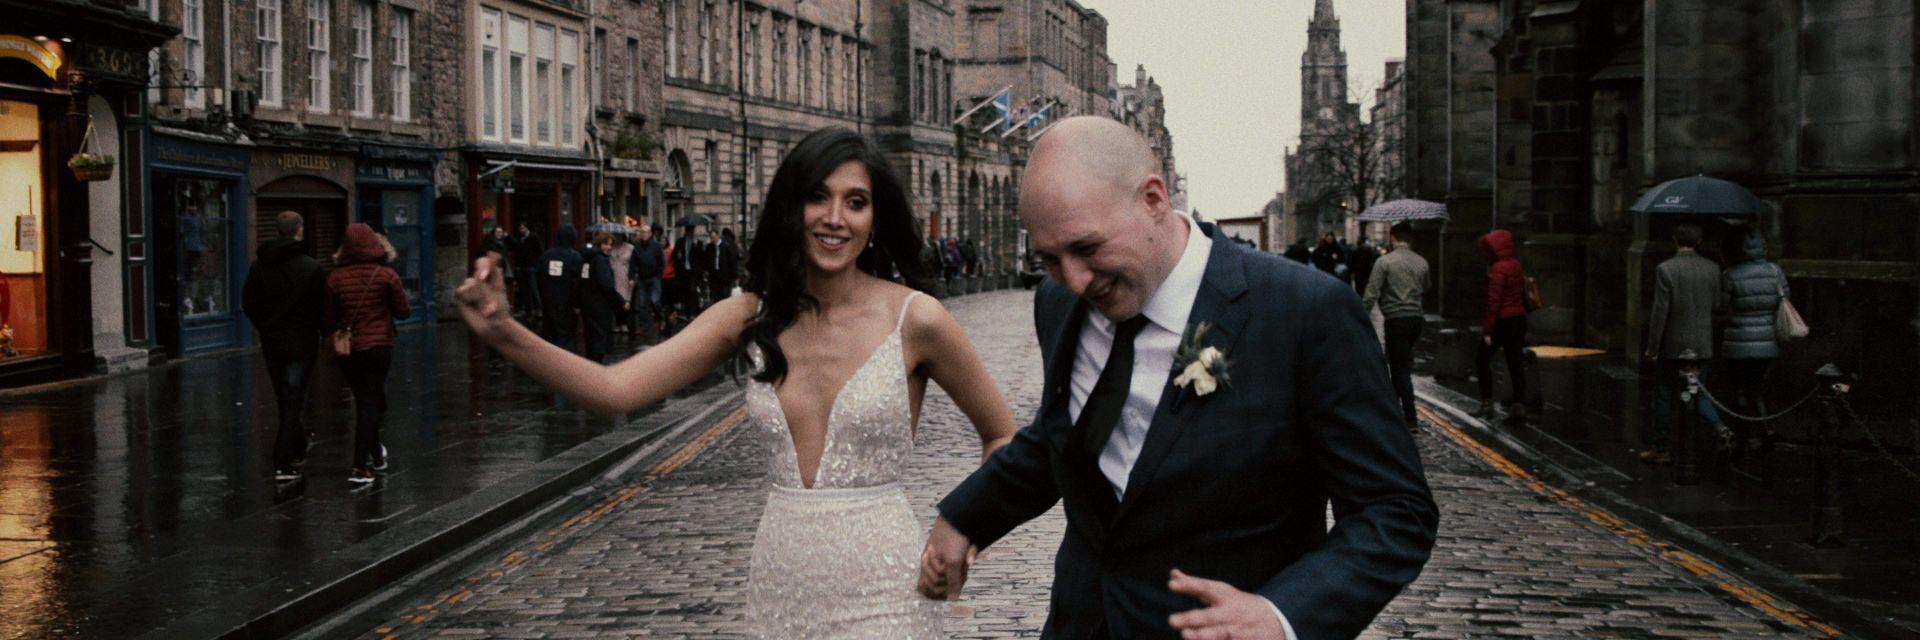 Algarve-wedding-videographer-cinemate-films-04